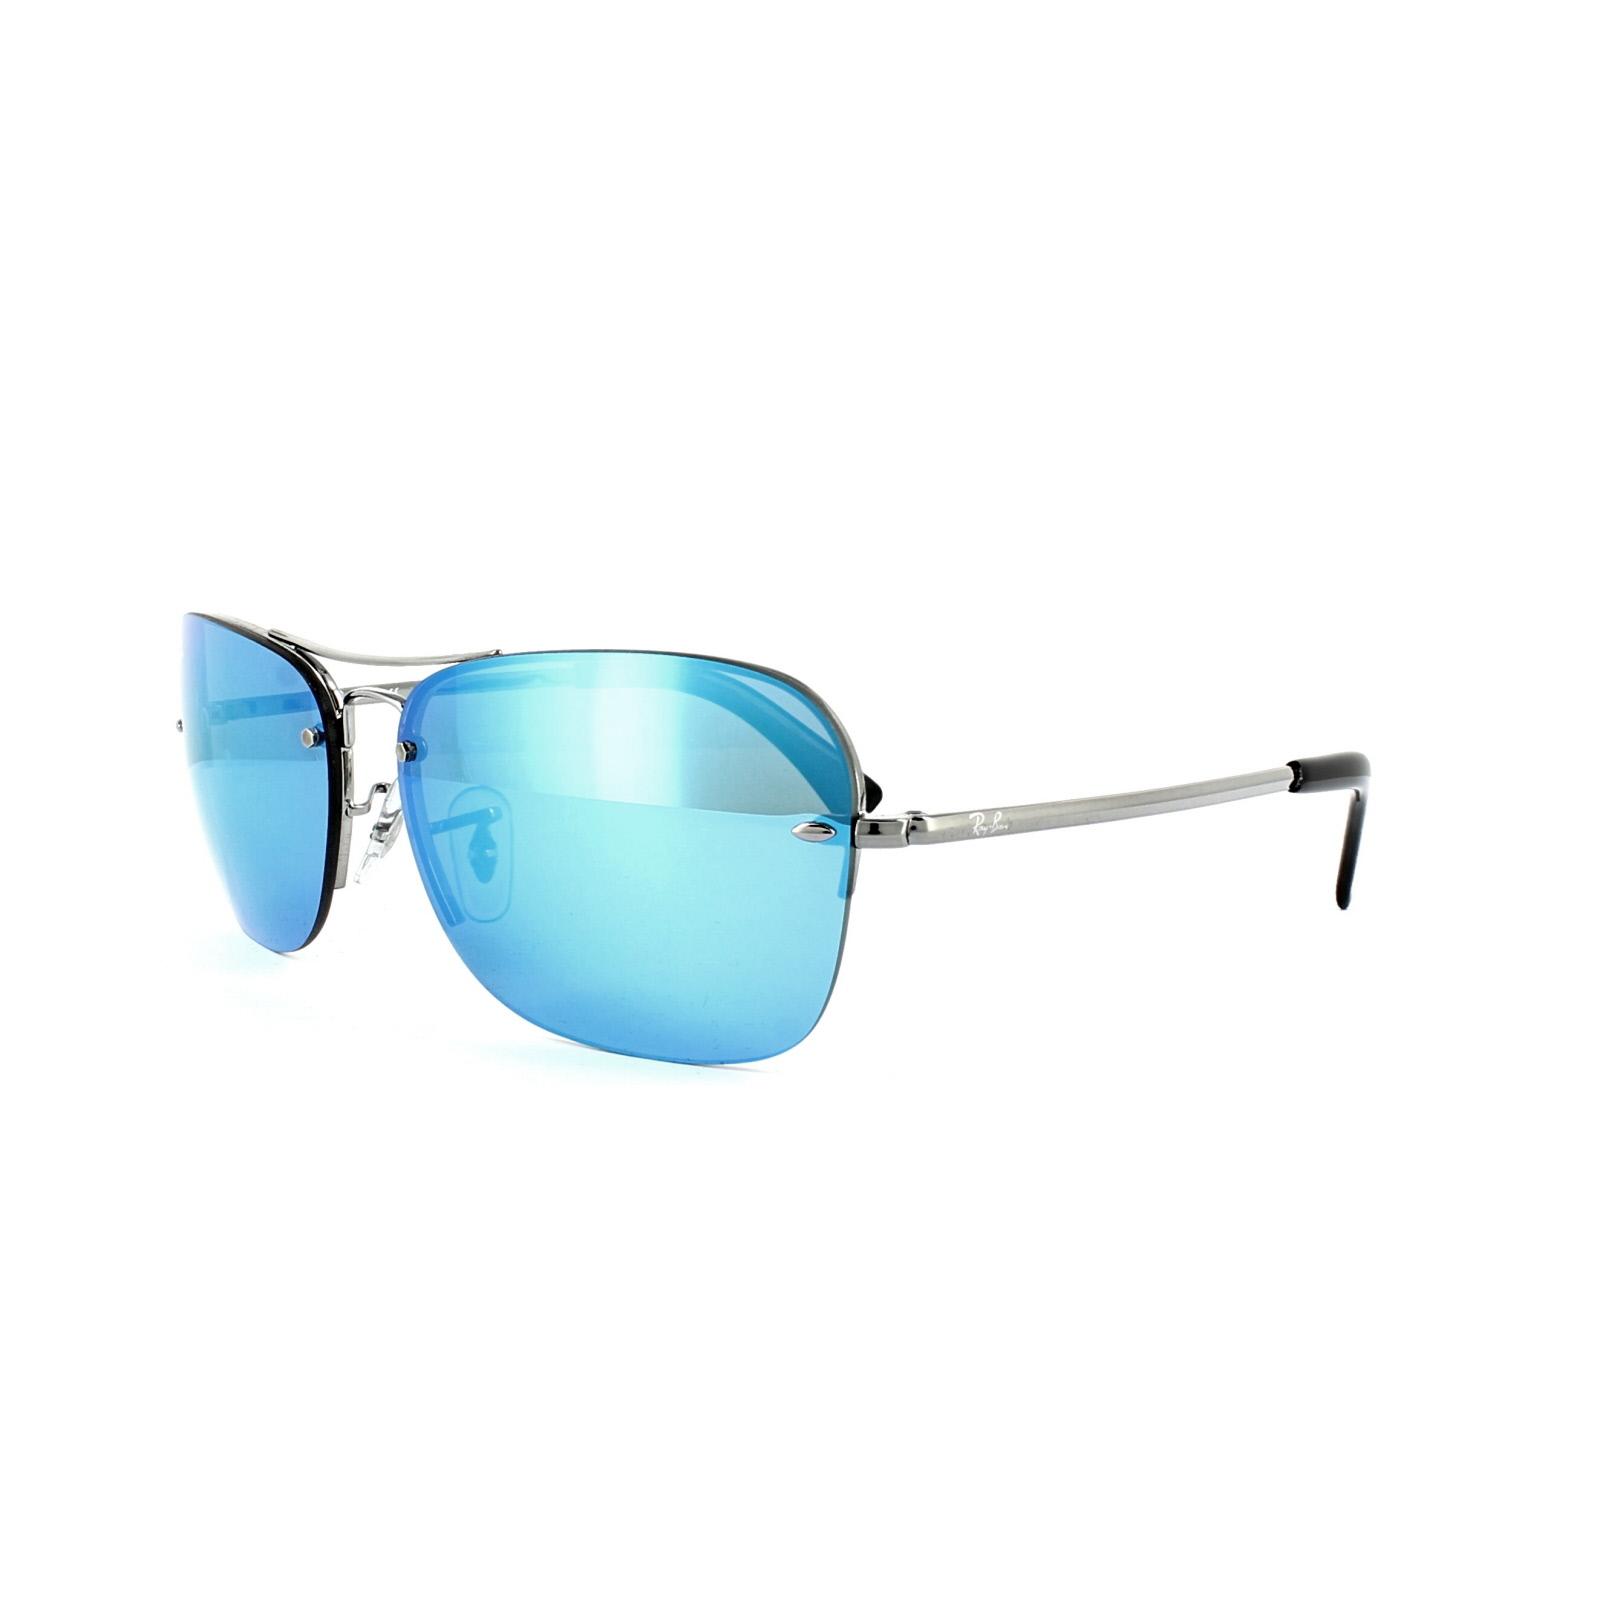 ray ban sonnenbrille 3541 004 55 ruthenium blau spiegel. Black Bedroom Furniture Sets. Home Design Ideas